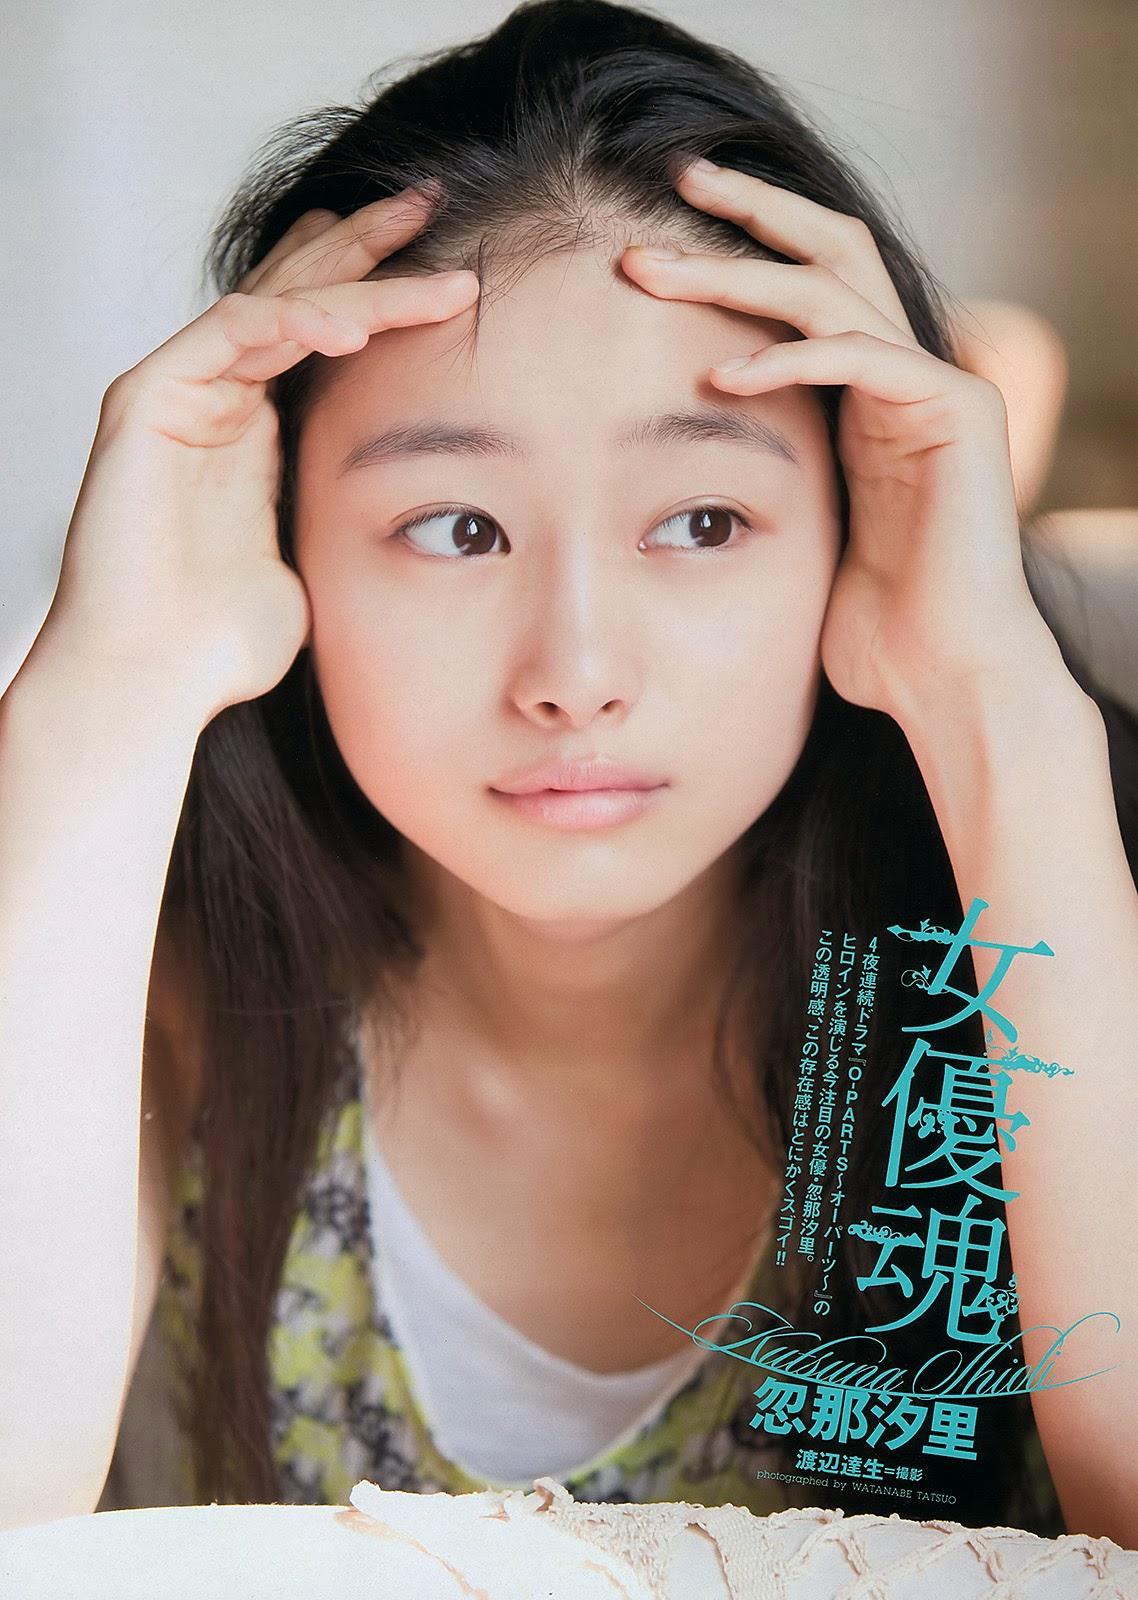 Kutsuna Shiori 忽那汐里 Weekly Playboy No 11 2012 Pictures